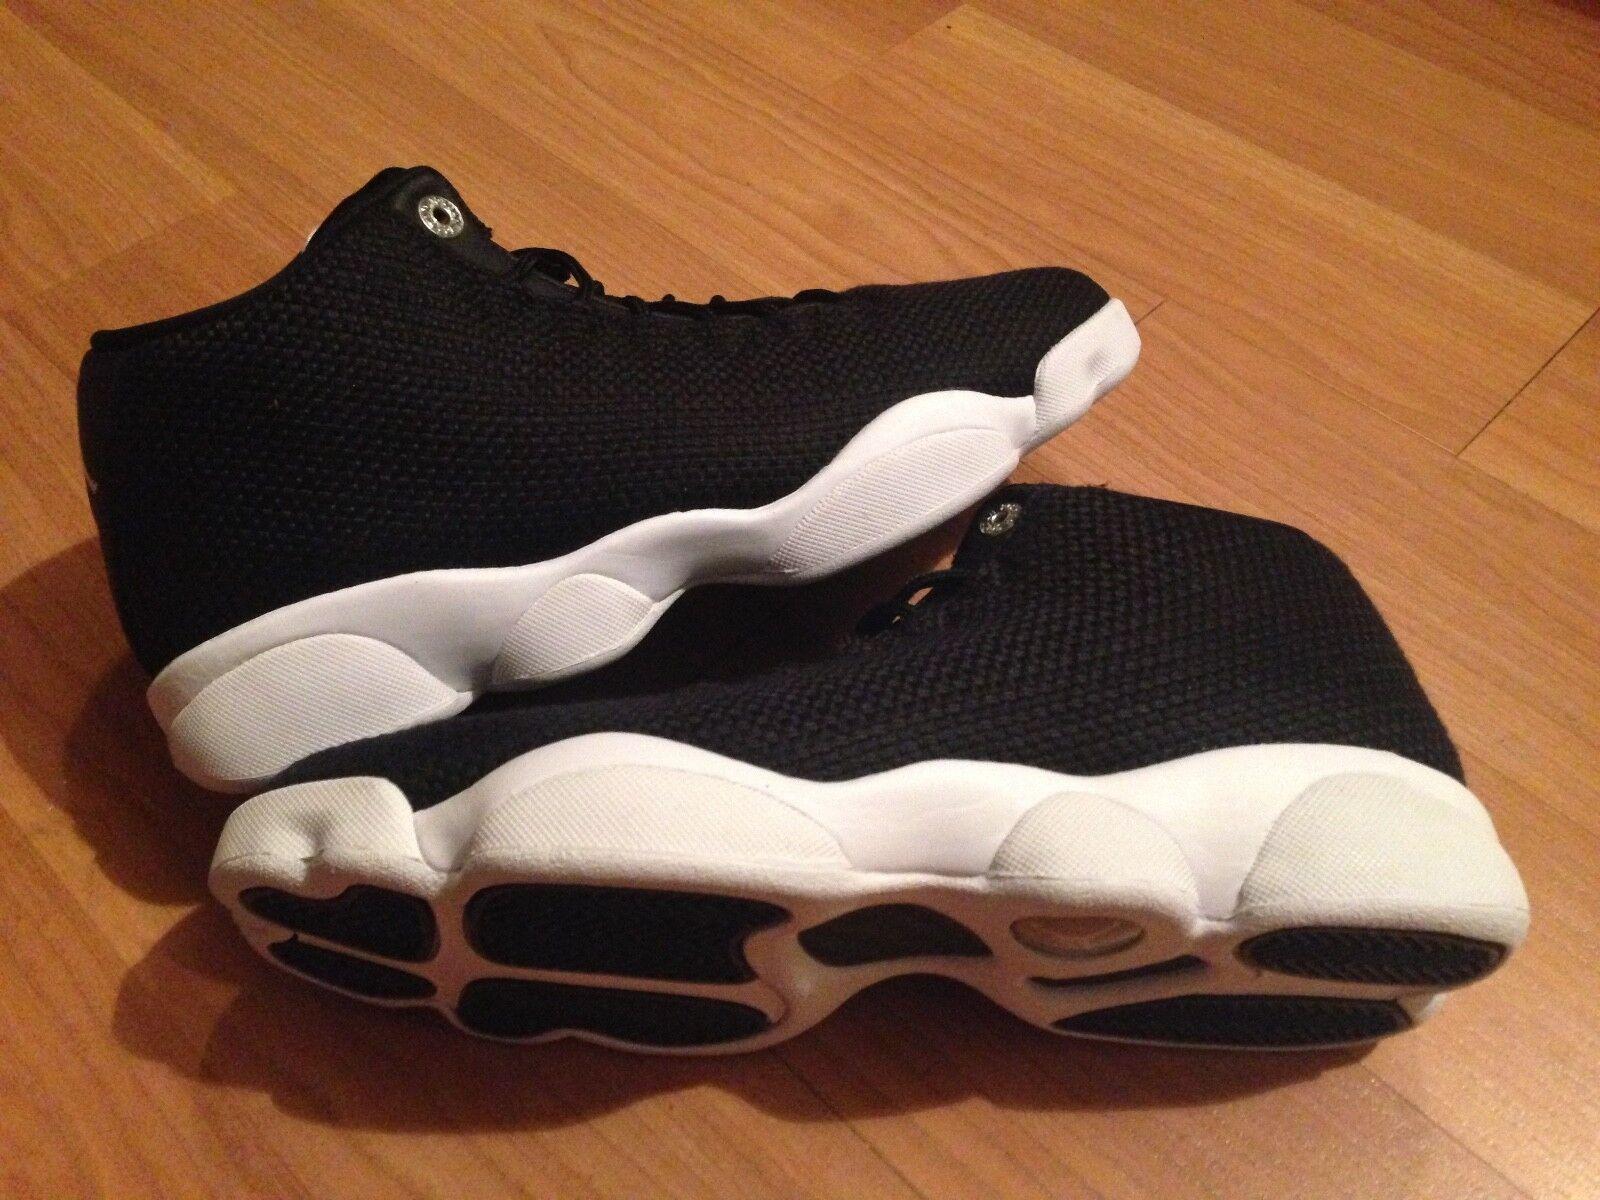 Jordan Horizon LOW Men's Size 8 BASKETBALL SHOES NIB BLACK WHITE 845098 006, NIB SHOES 5e9685